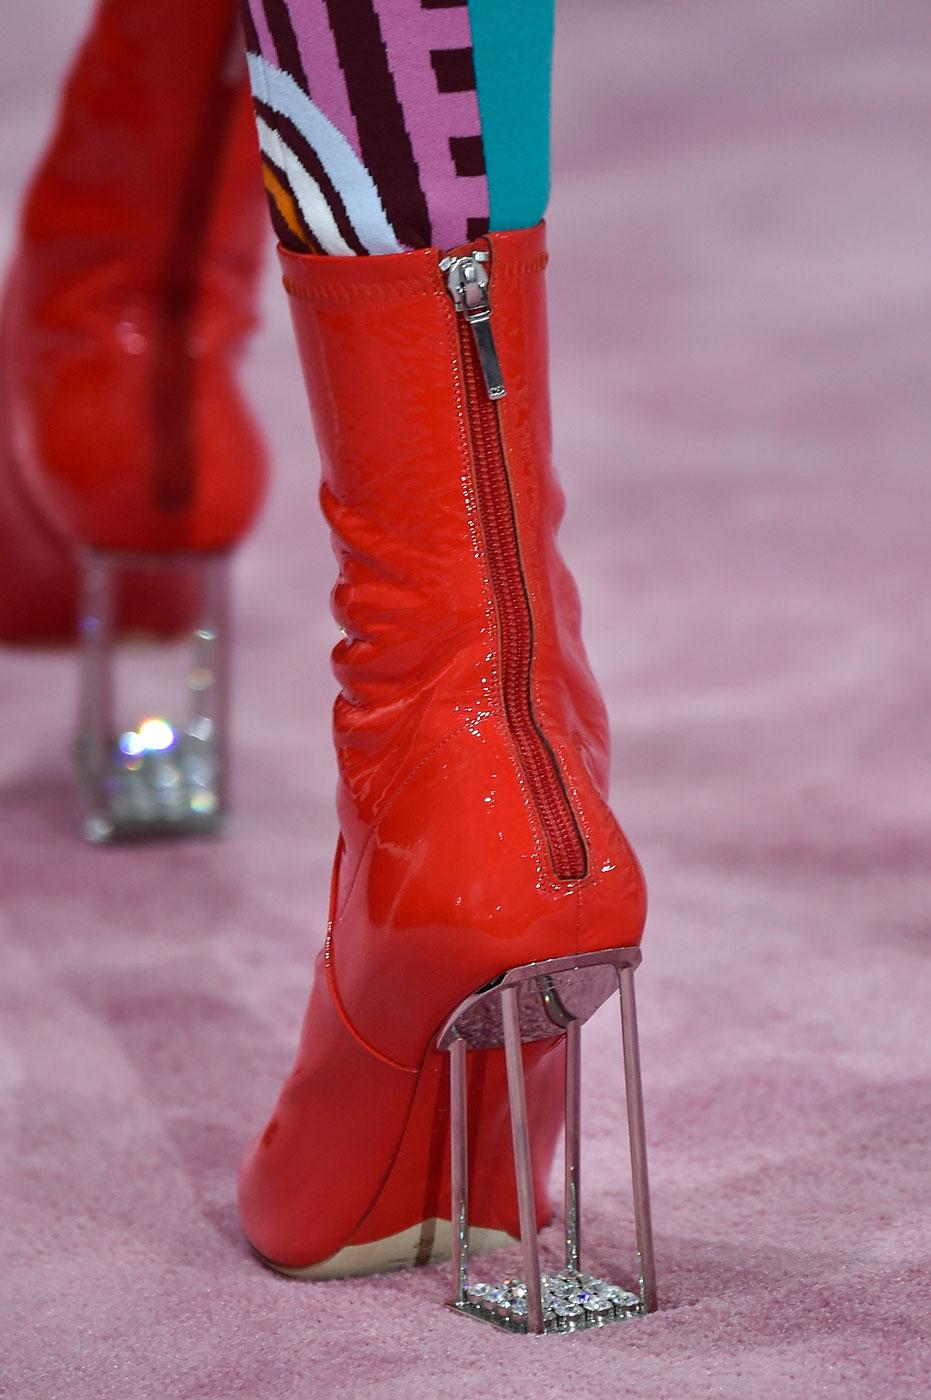 Christian-Dior-fashion-runway-show-close-ups-haute-couture-paris-spring-summer-2015-the-impression-014